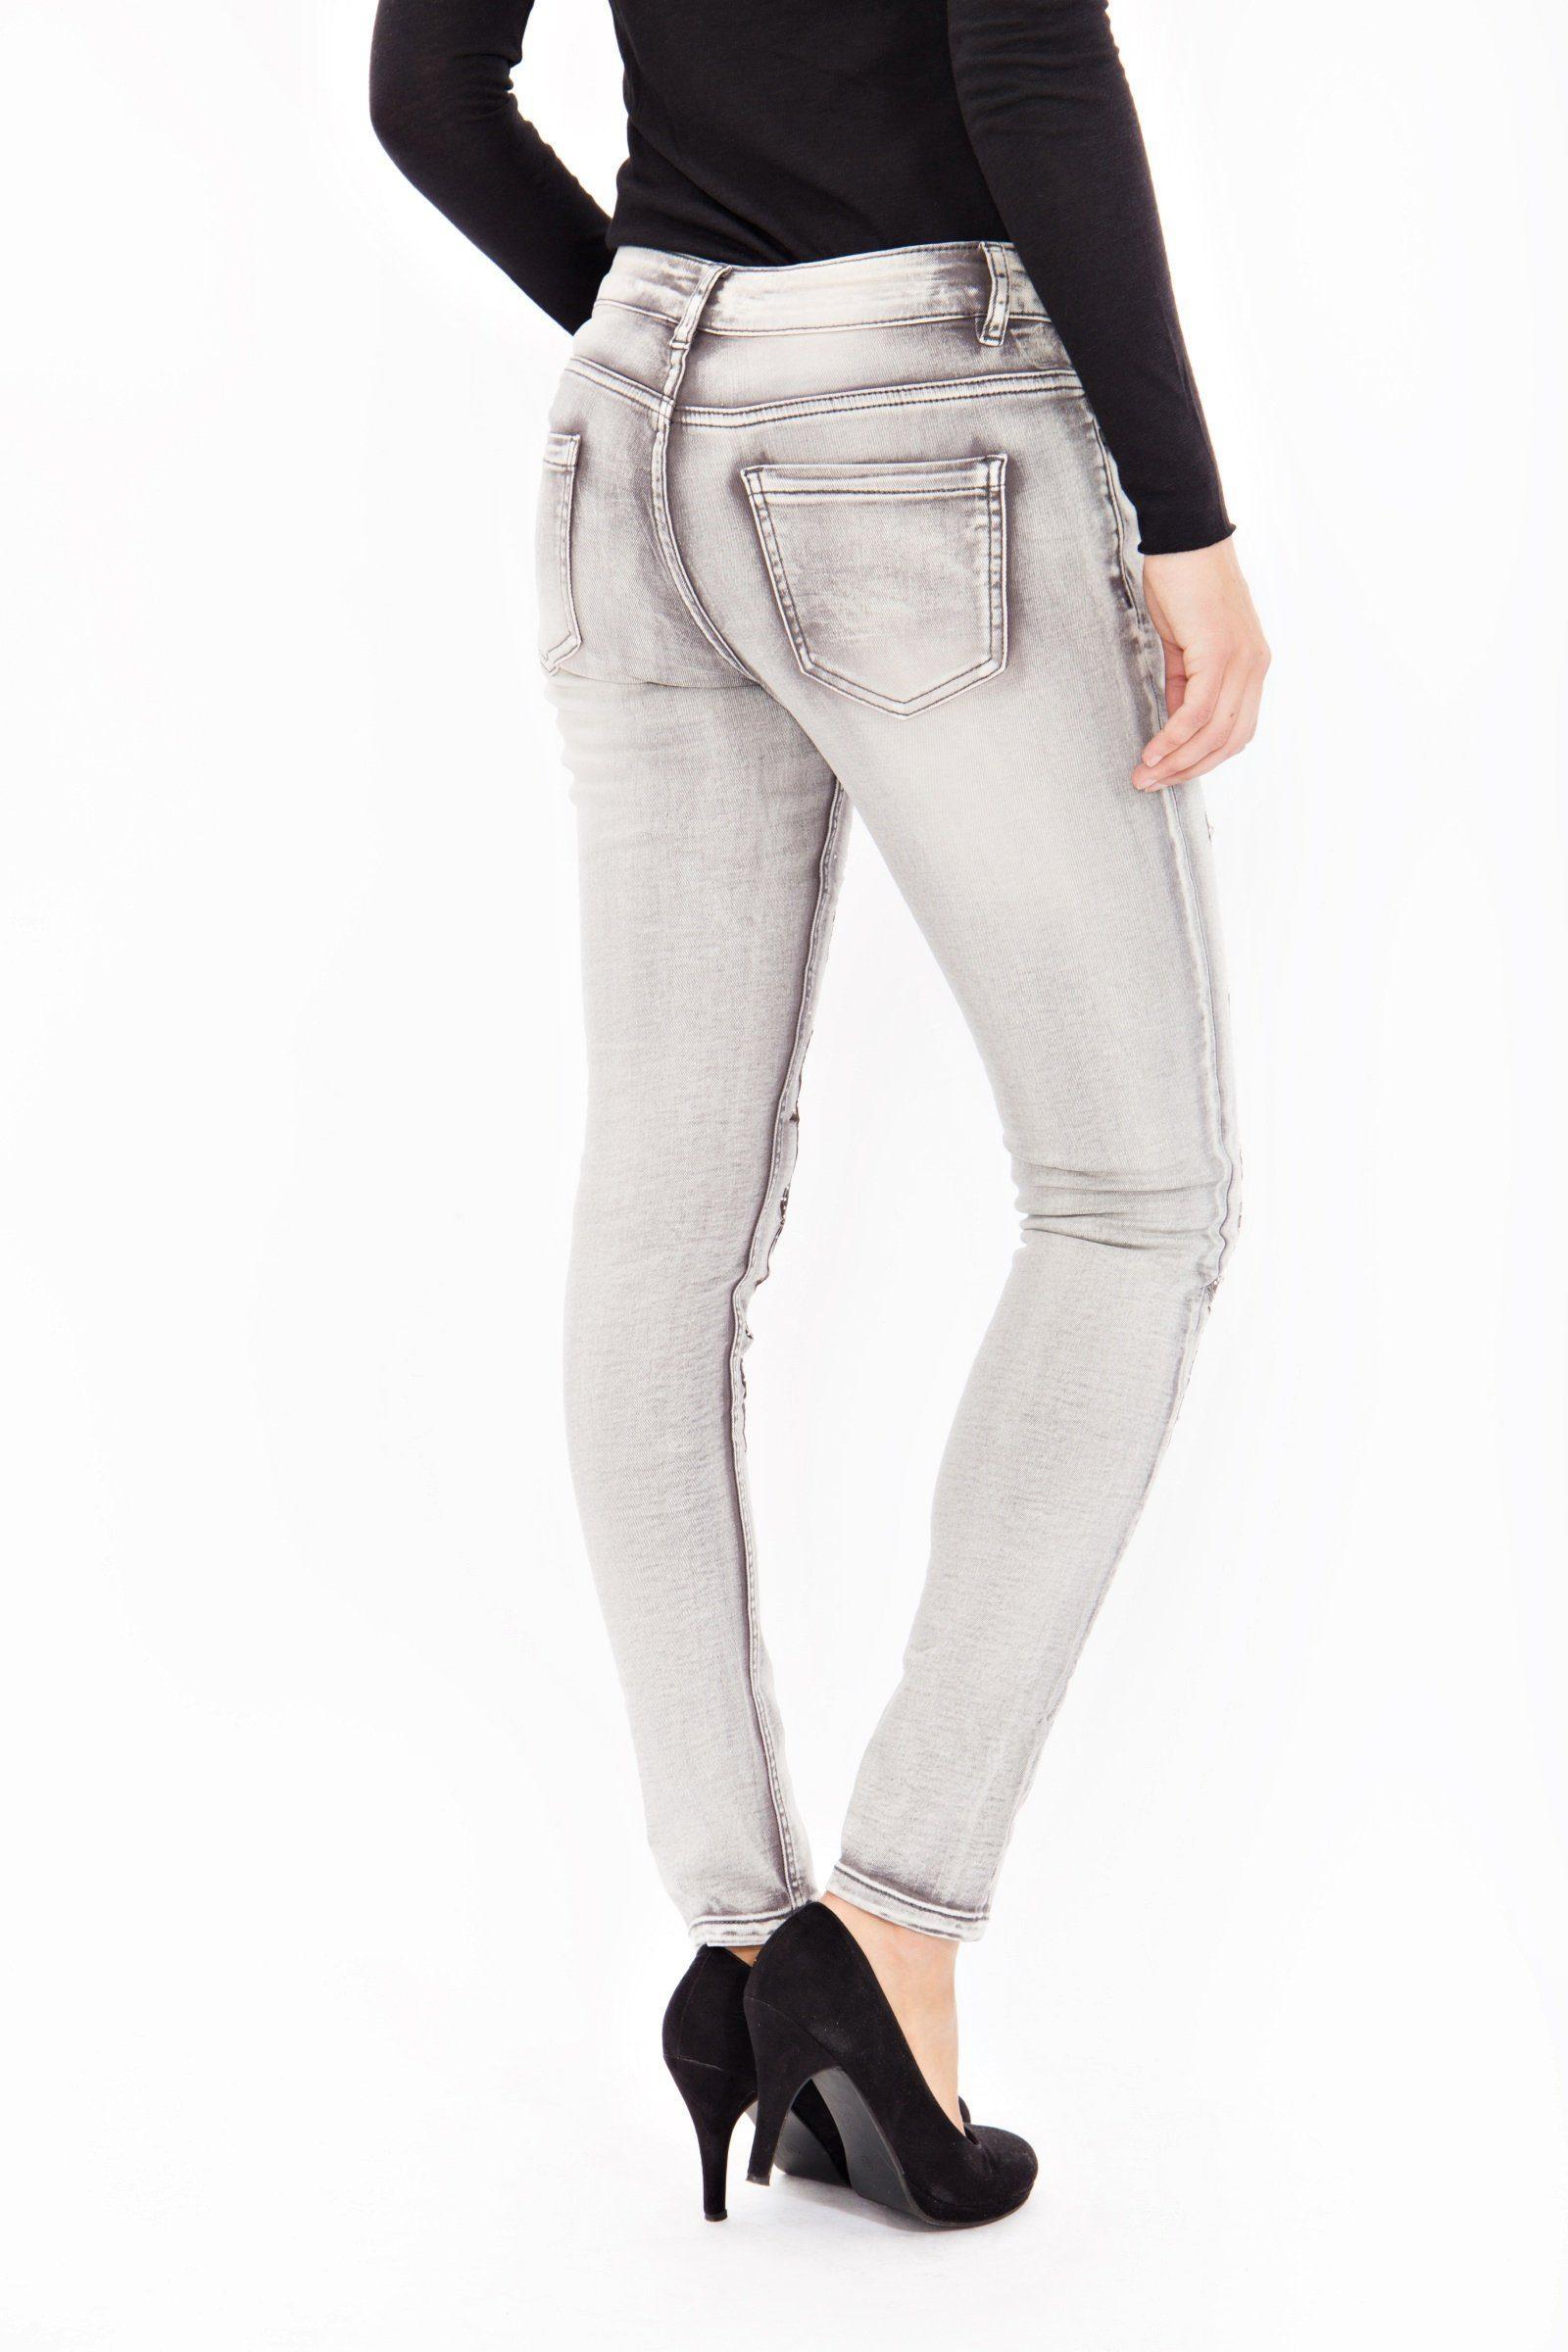 Blue Monkey Denim Skinny-fit-Jeans Honey 8081 in Grau BC5o7